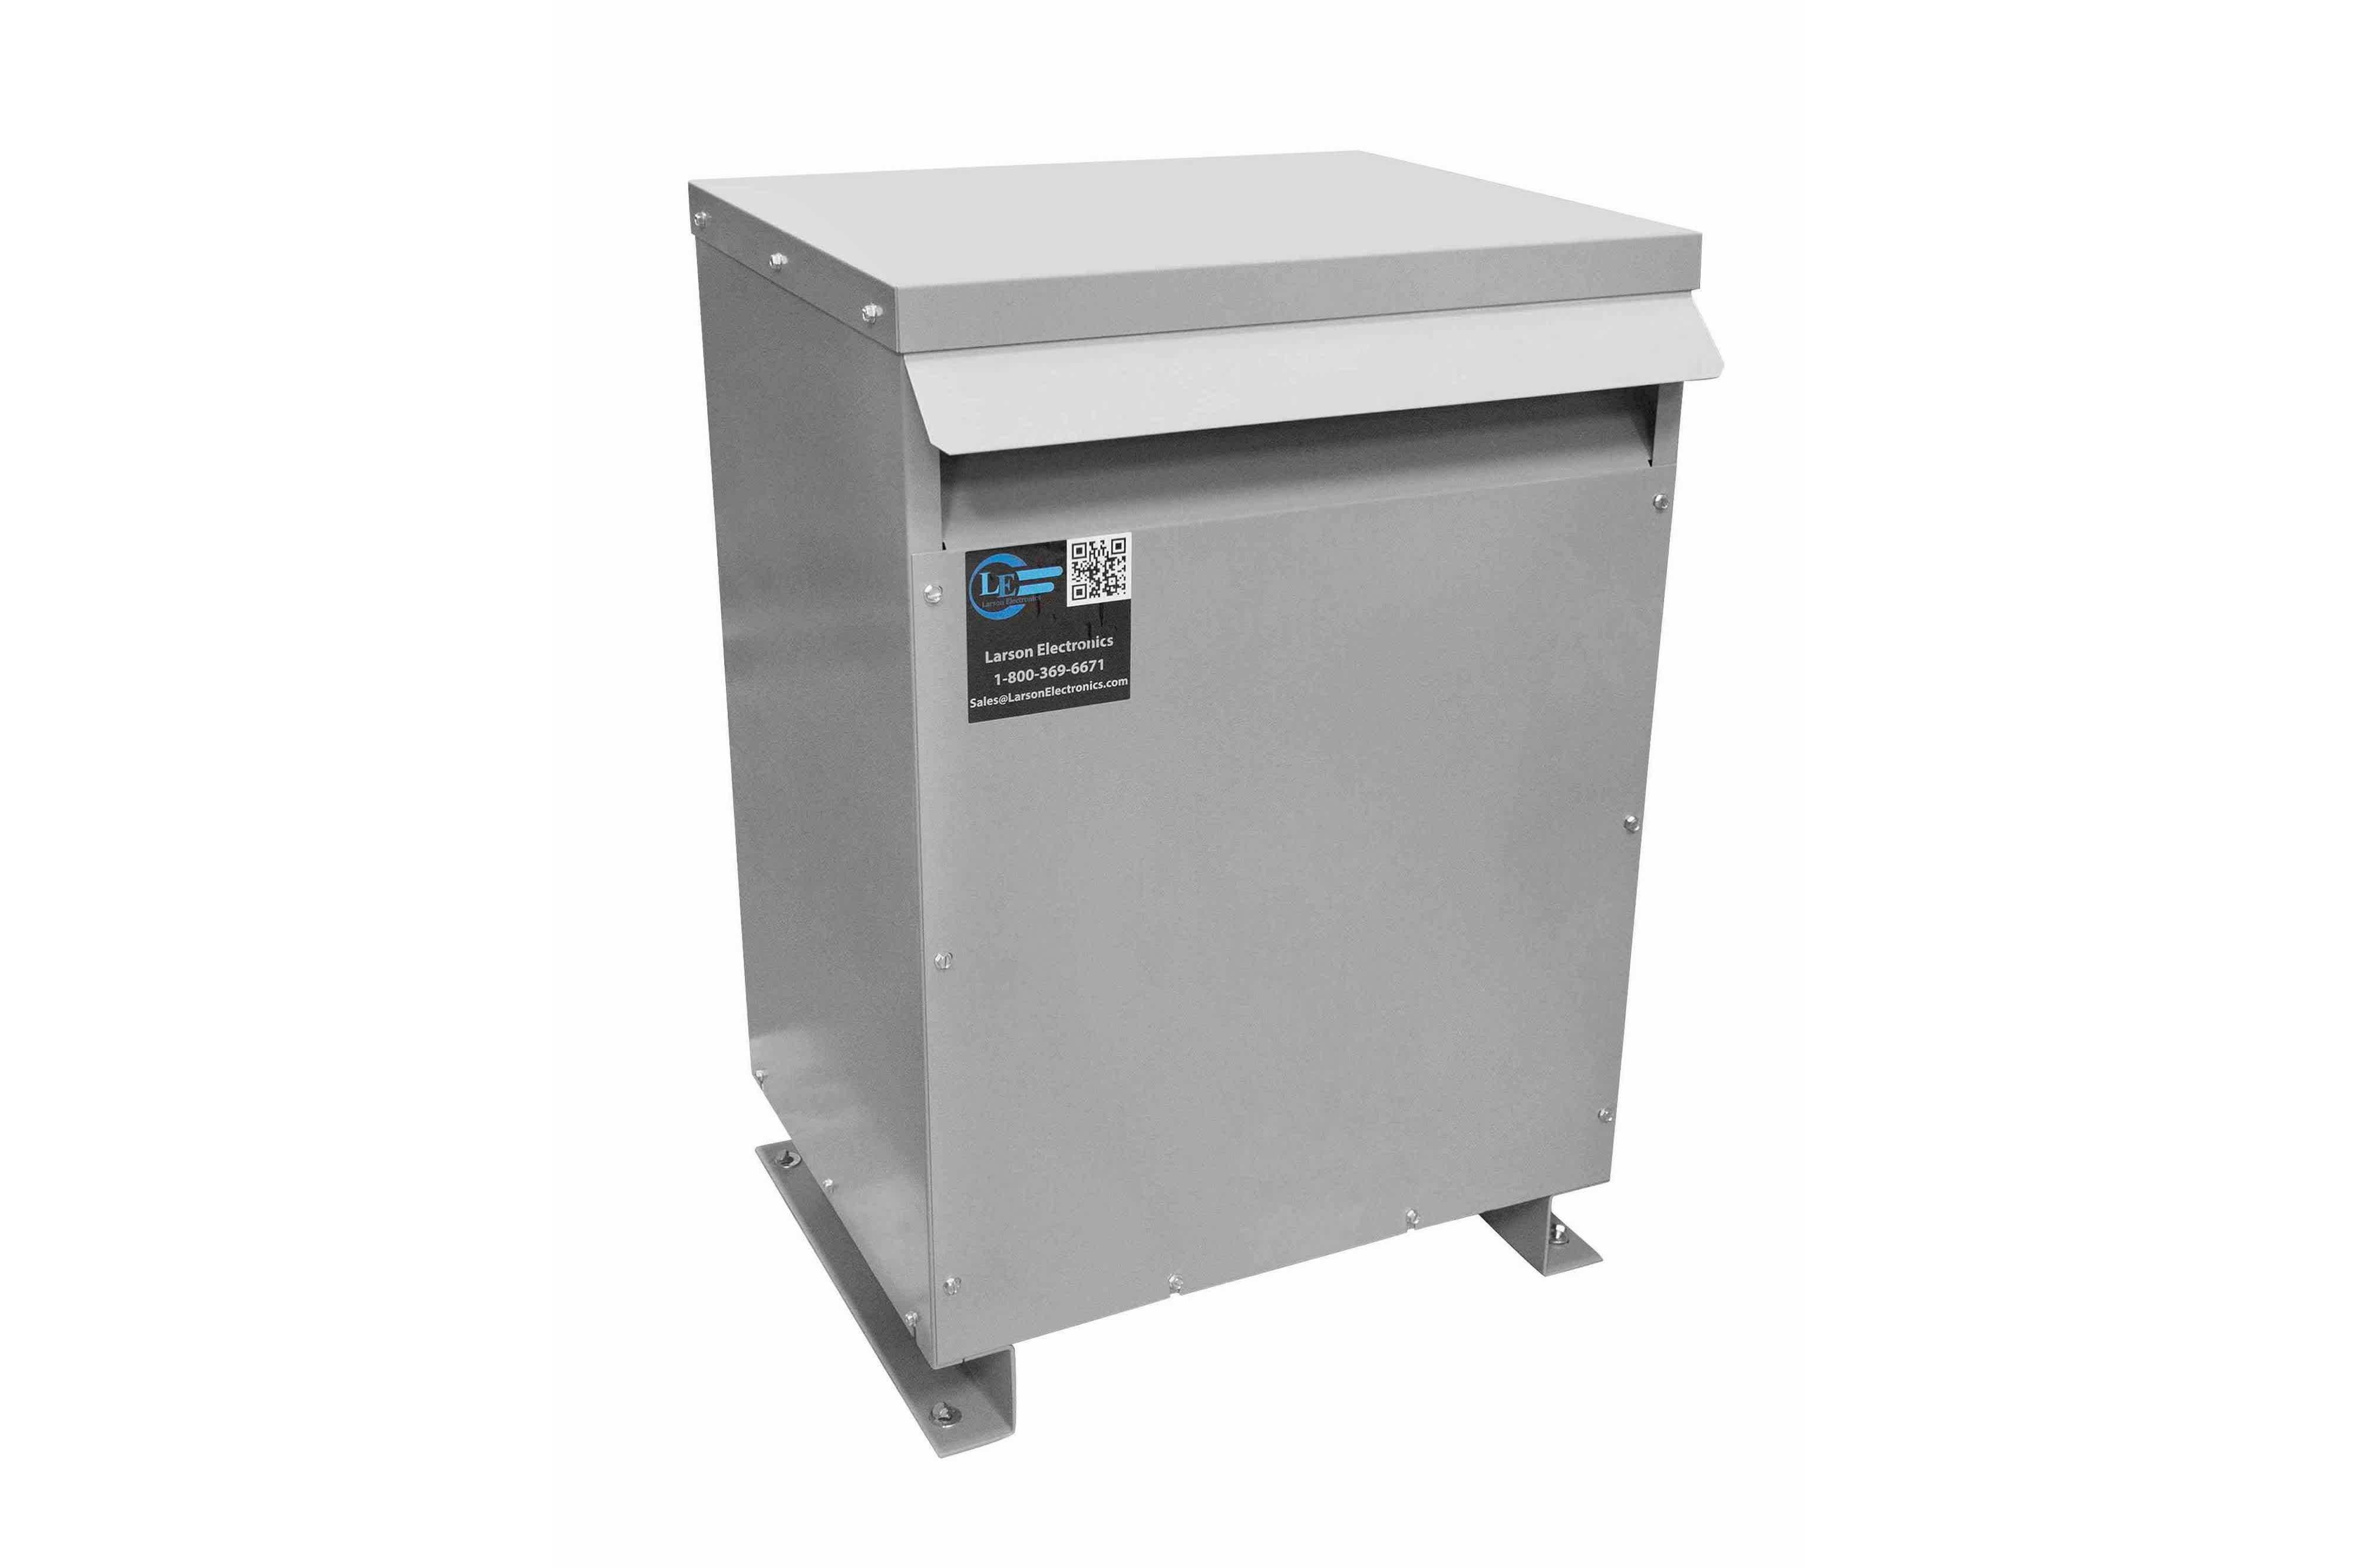 125 kVA 3PH Isolation Transformer, 575V Wye Primary, 400V Delta Secondary, N3R, Ventilated, 60 Hz